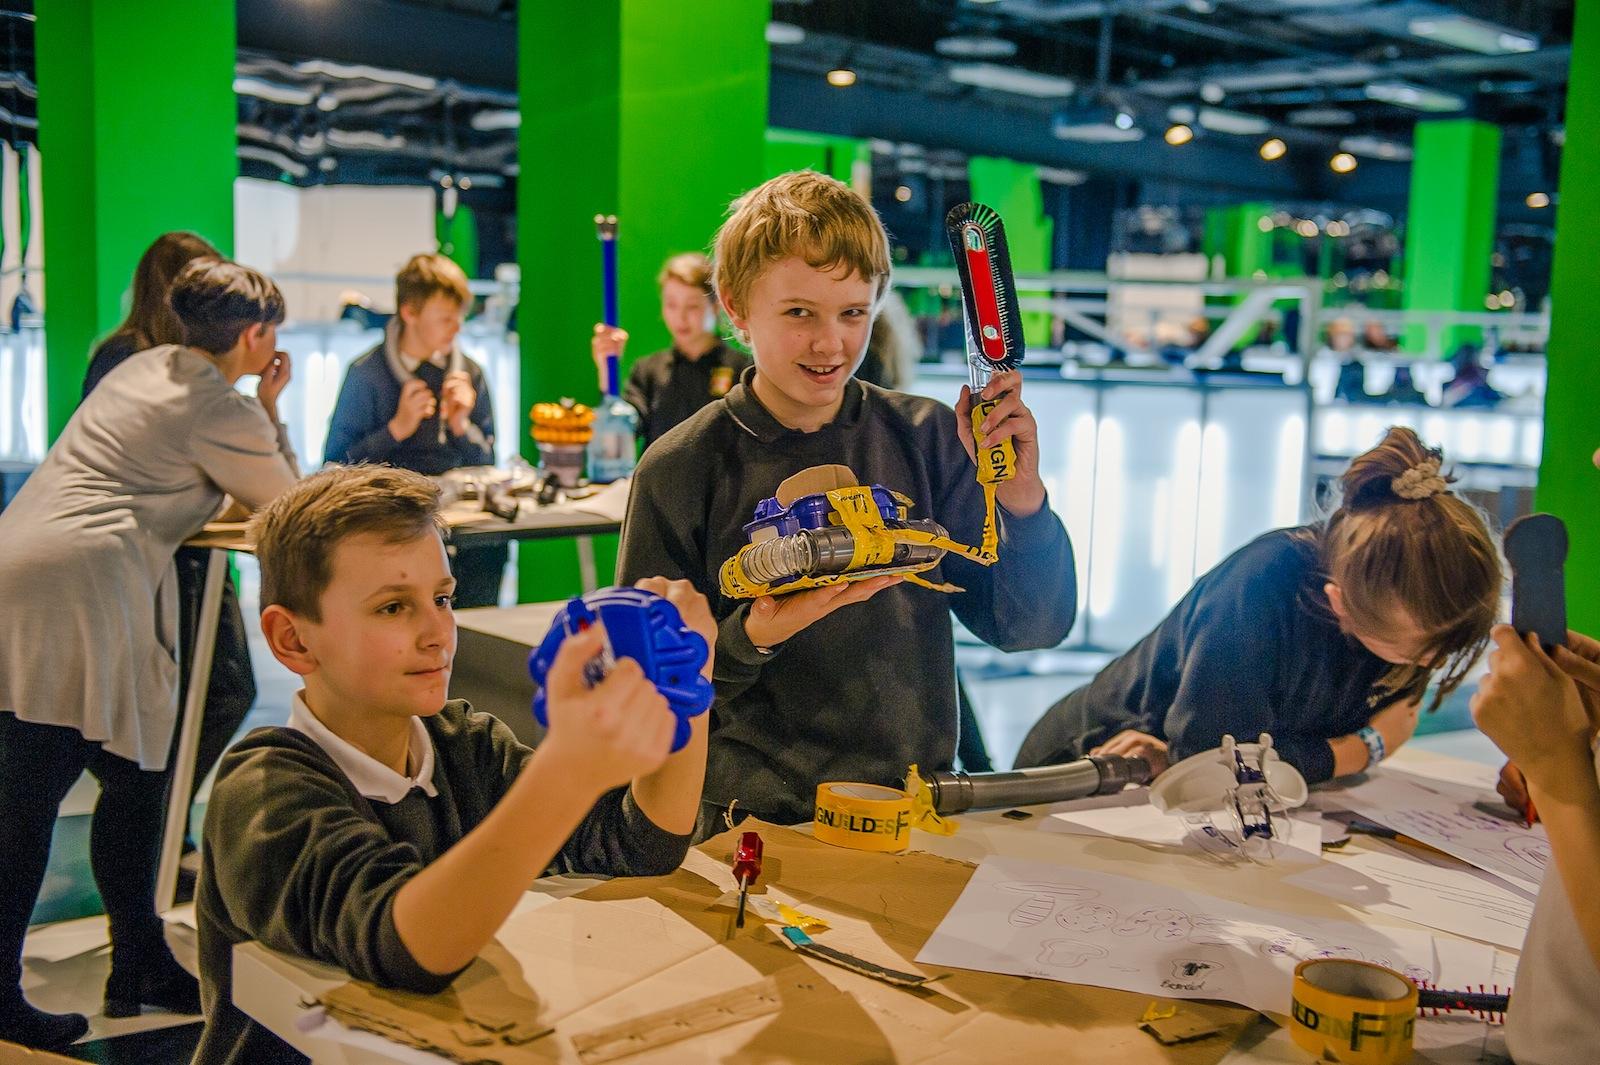 Enter The James Dyson Design Contest – Build Something That Solves A Problem